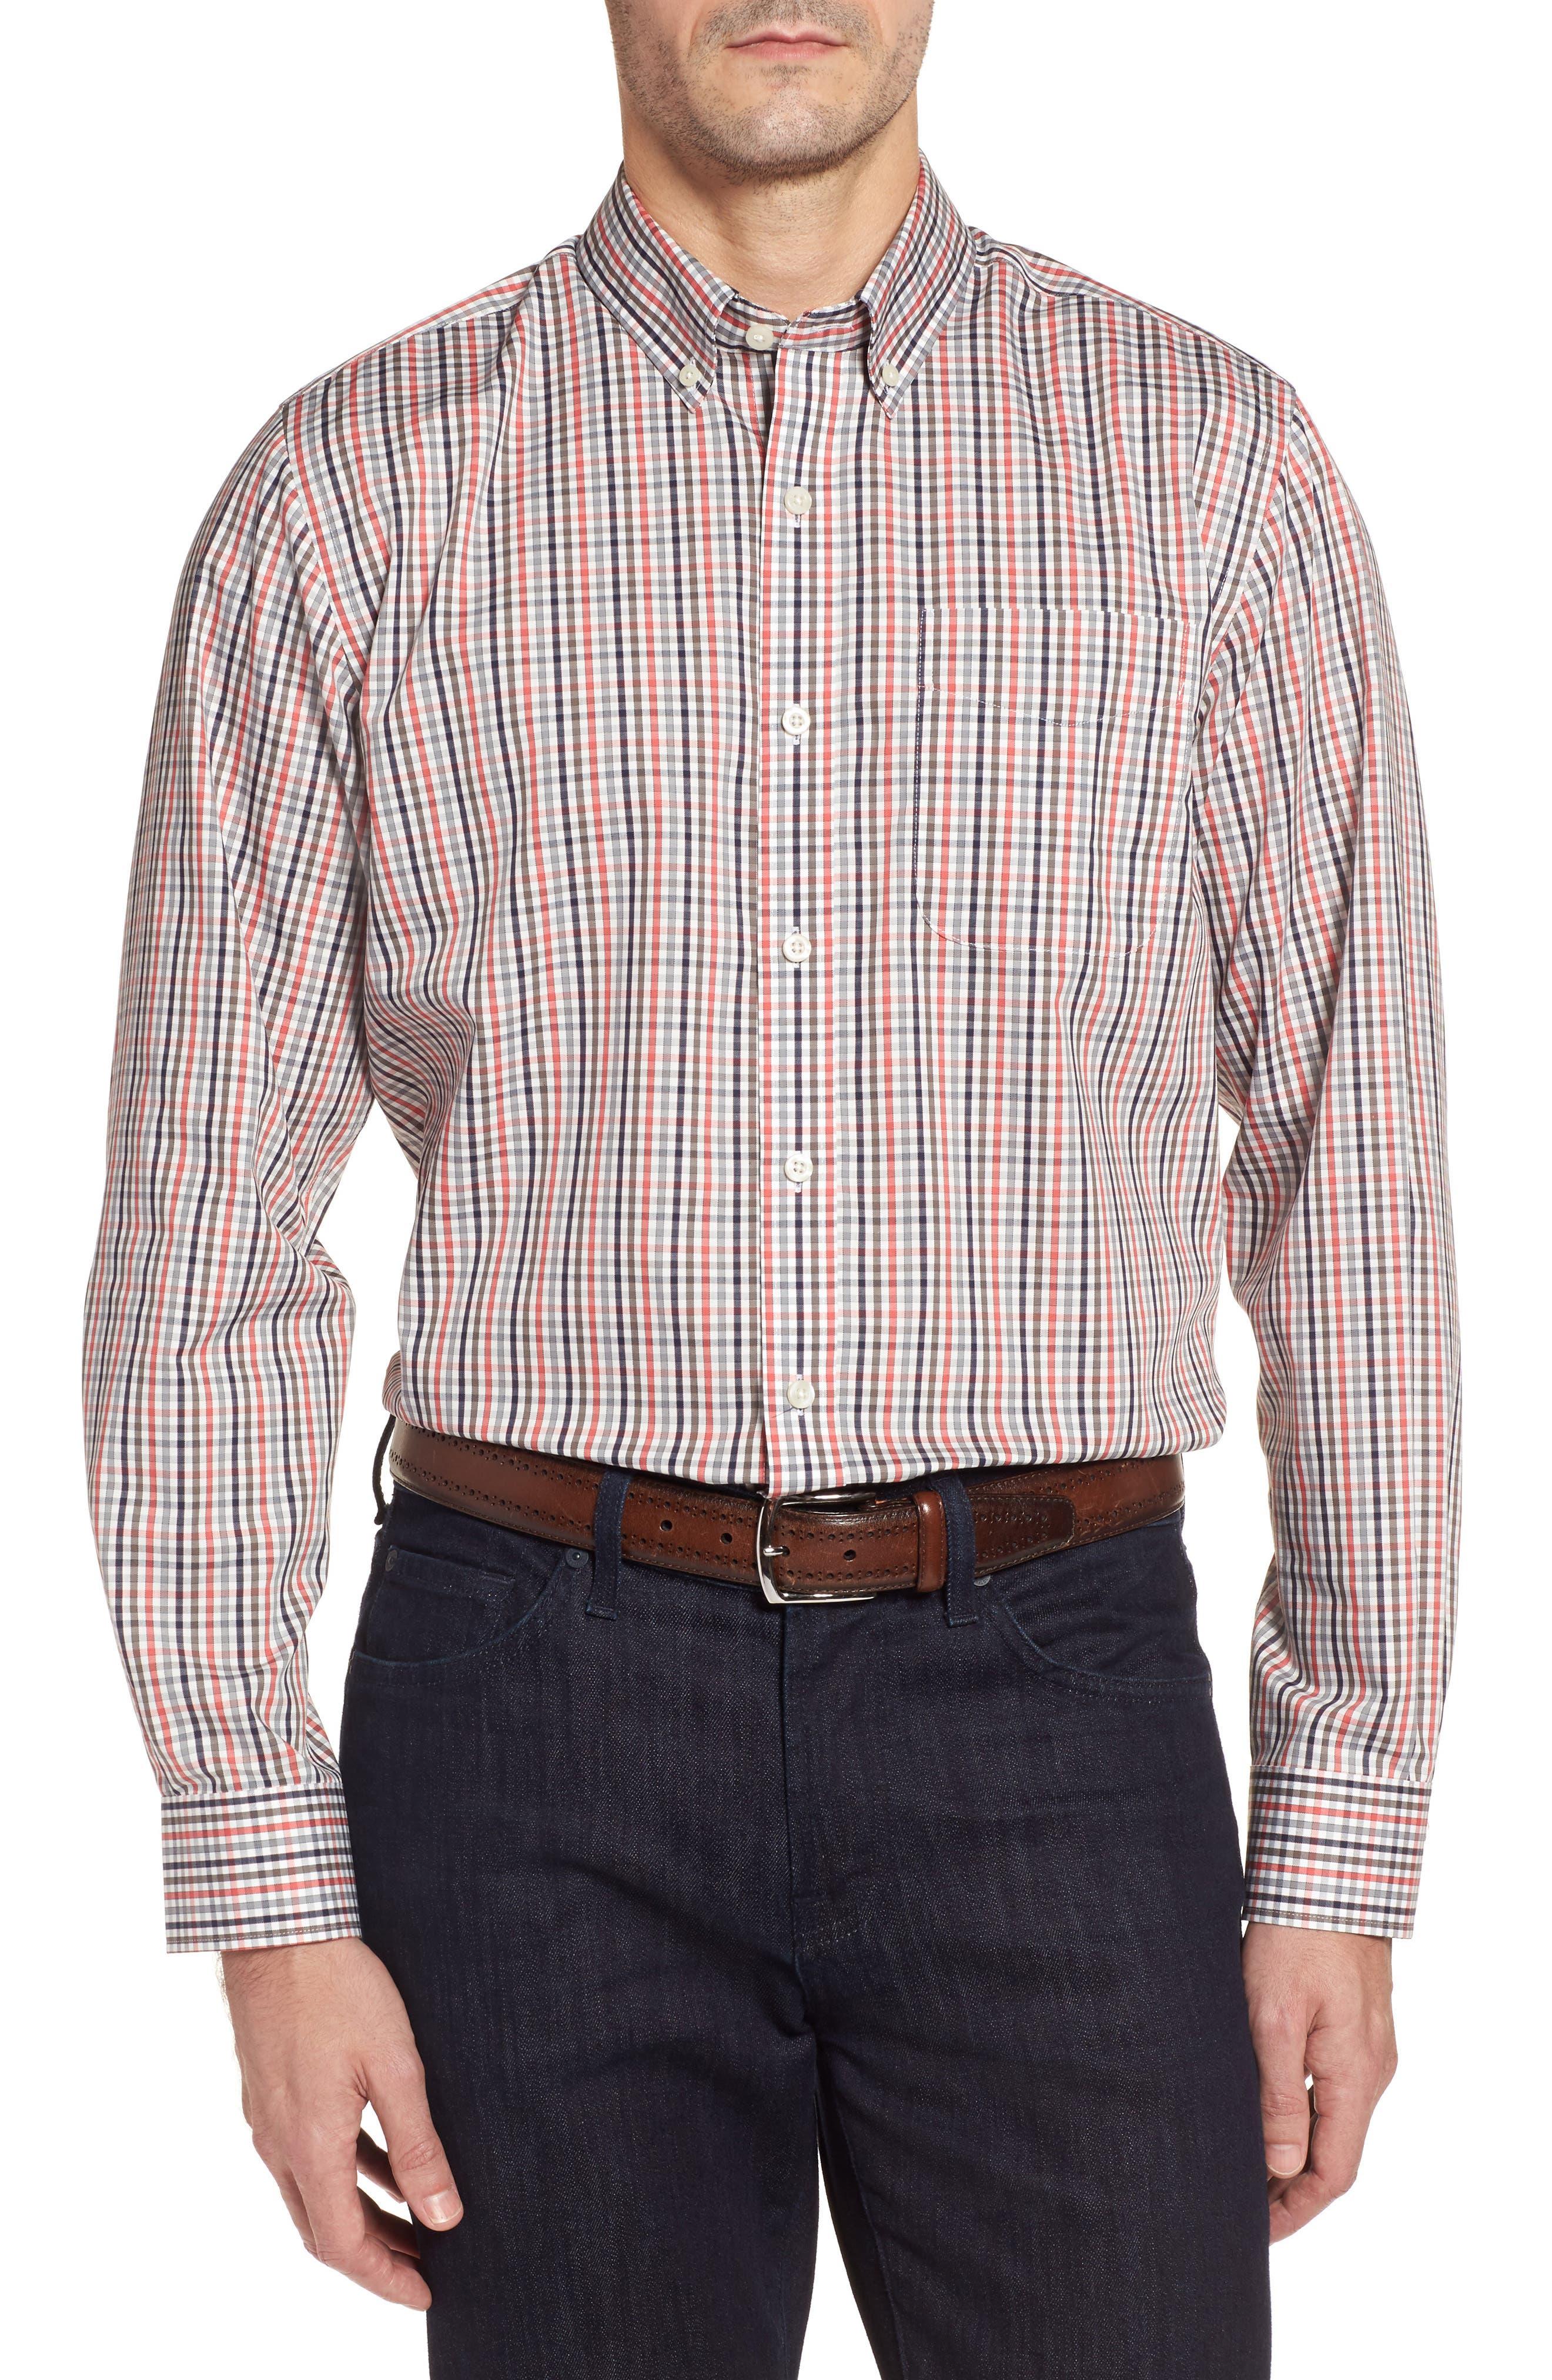 Baxter Epic Easy Care Classic Fit Plaid Sport Shirt,                         Main,                         color, 622